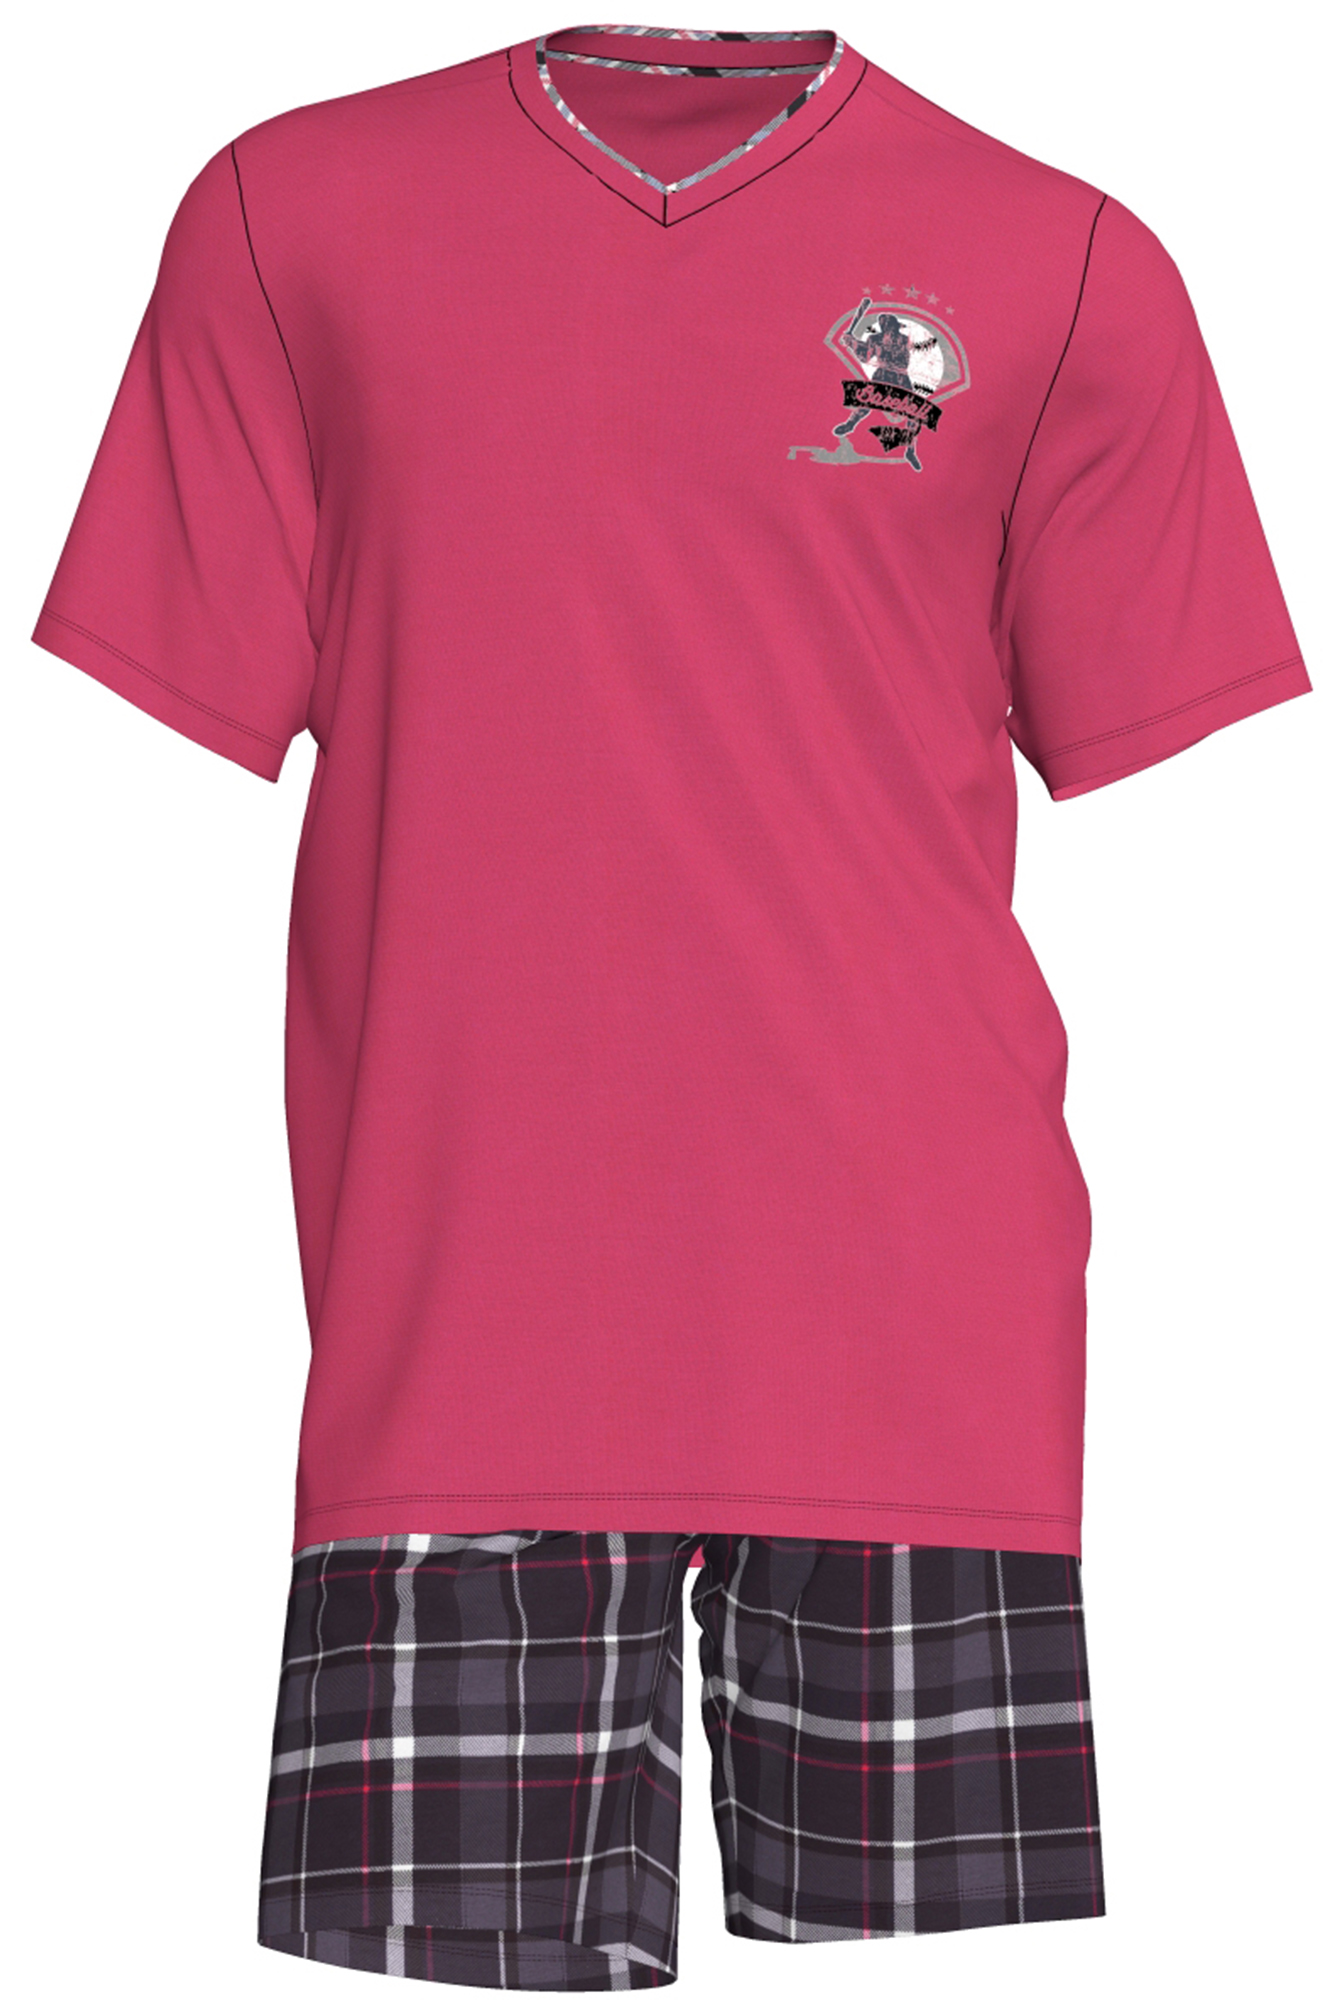 Pánské pyžamo Romeo 00-15-2831-308 - Vamp Barva: růžová, Velikost: M